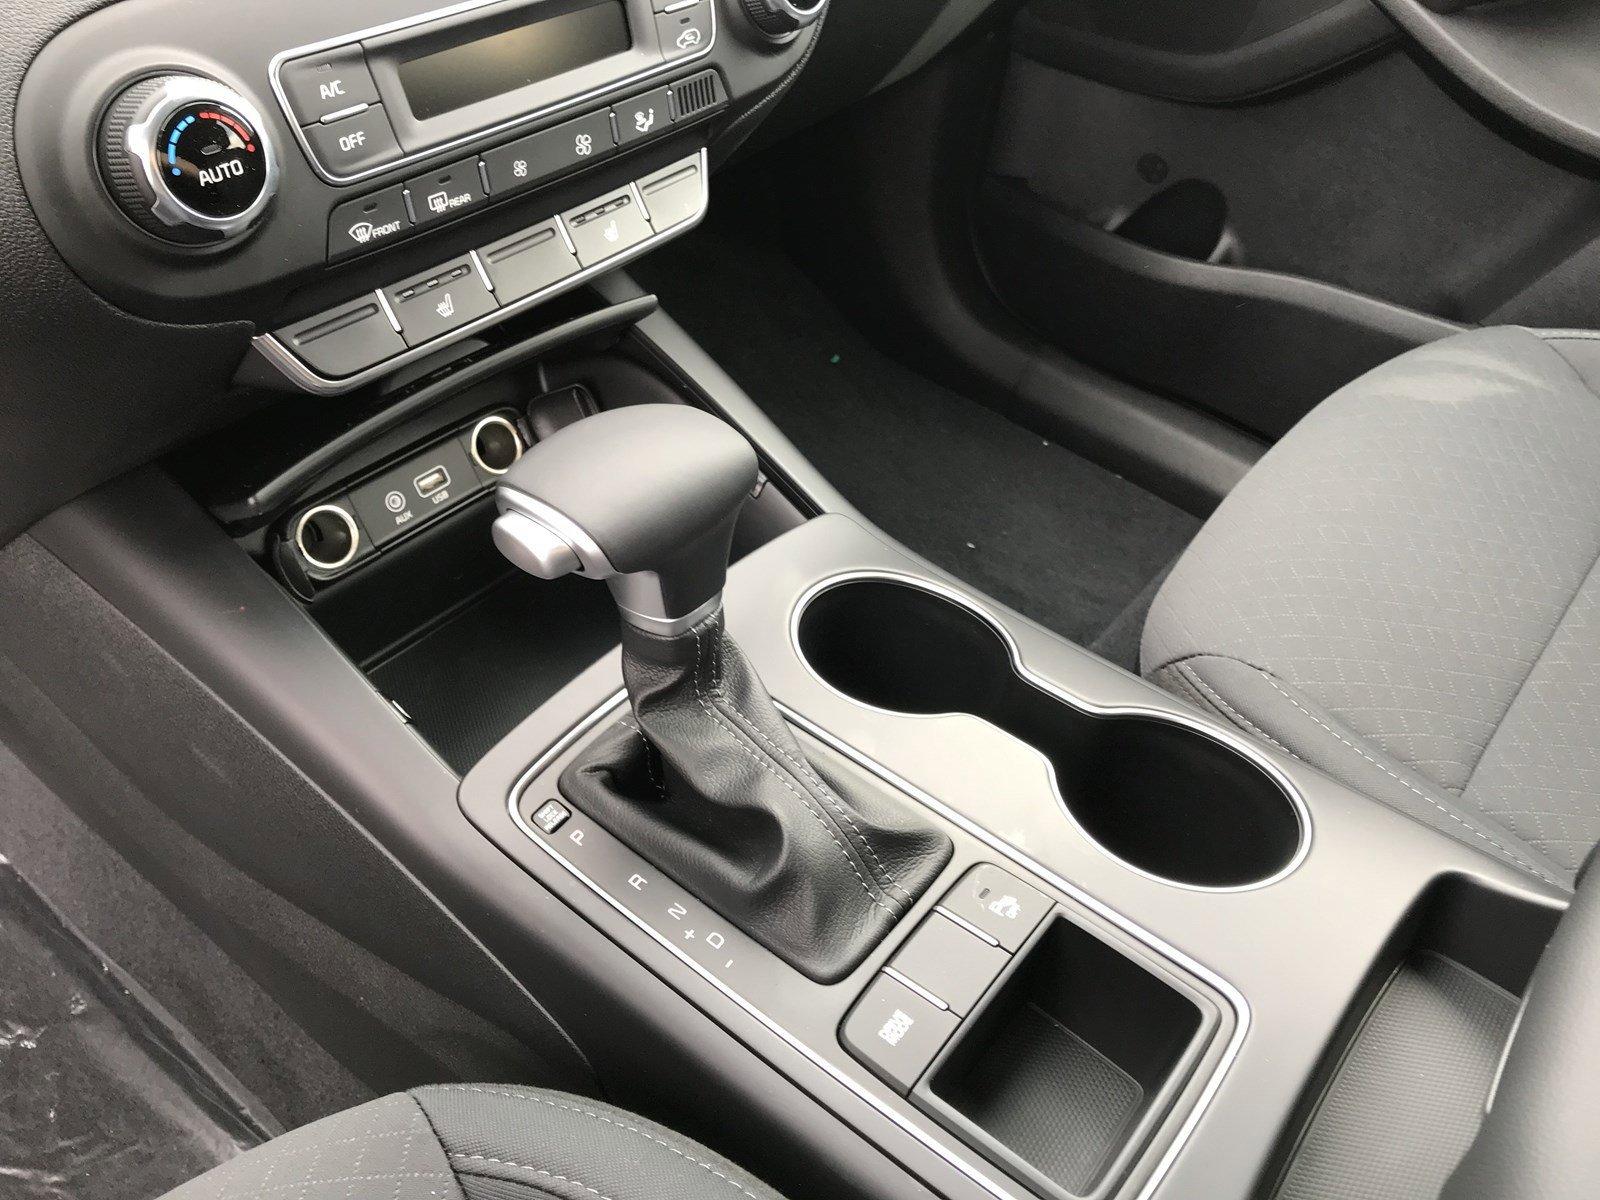 New 2020 Kia Sorento S V6